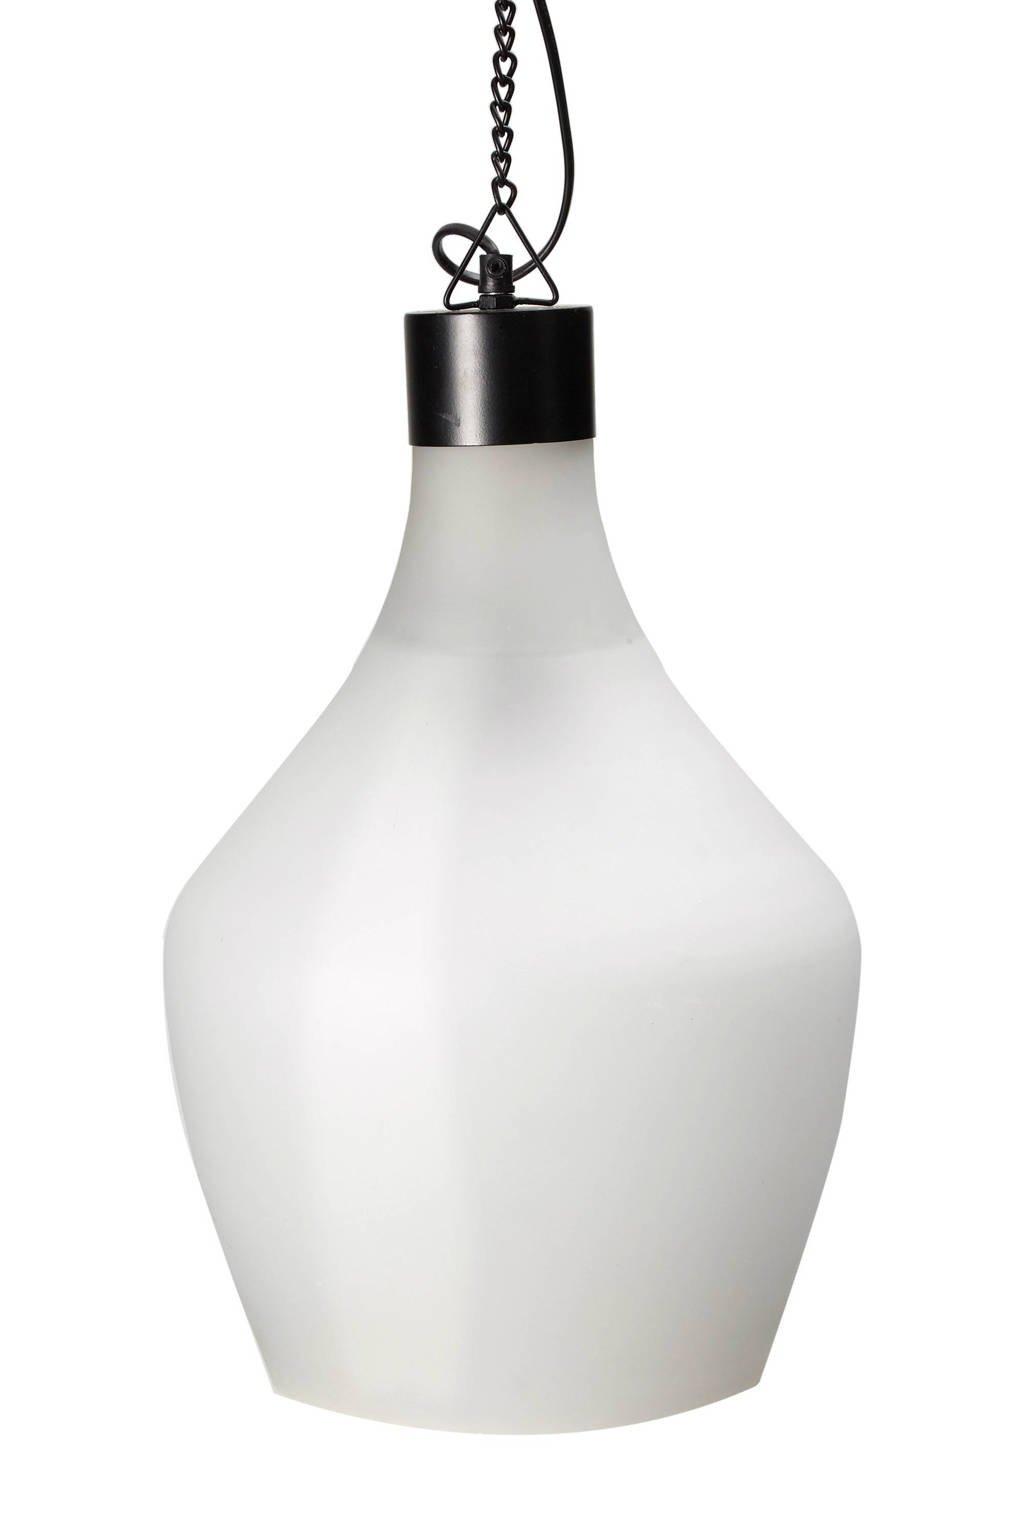 whkmp's own hanglamp, Wit/zwart